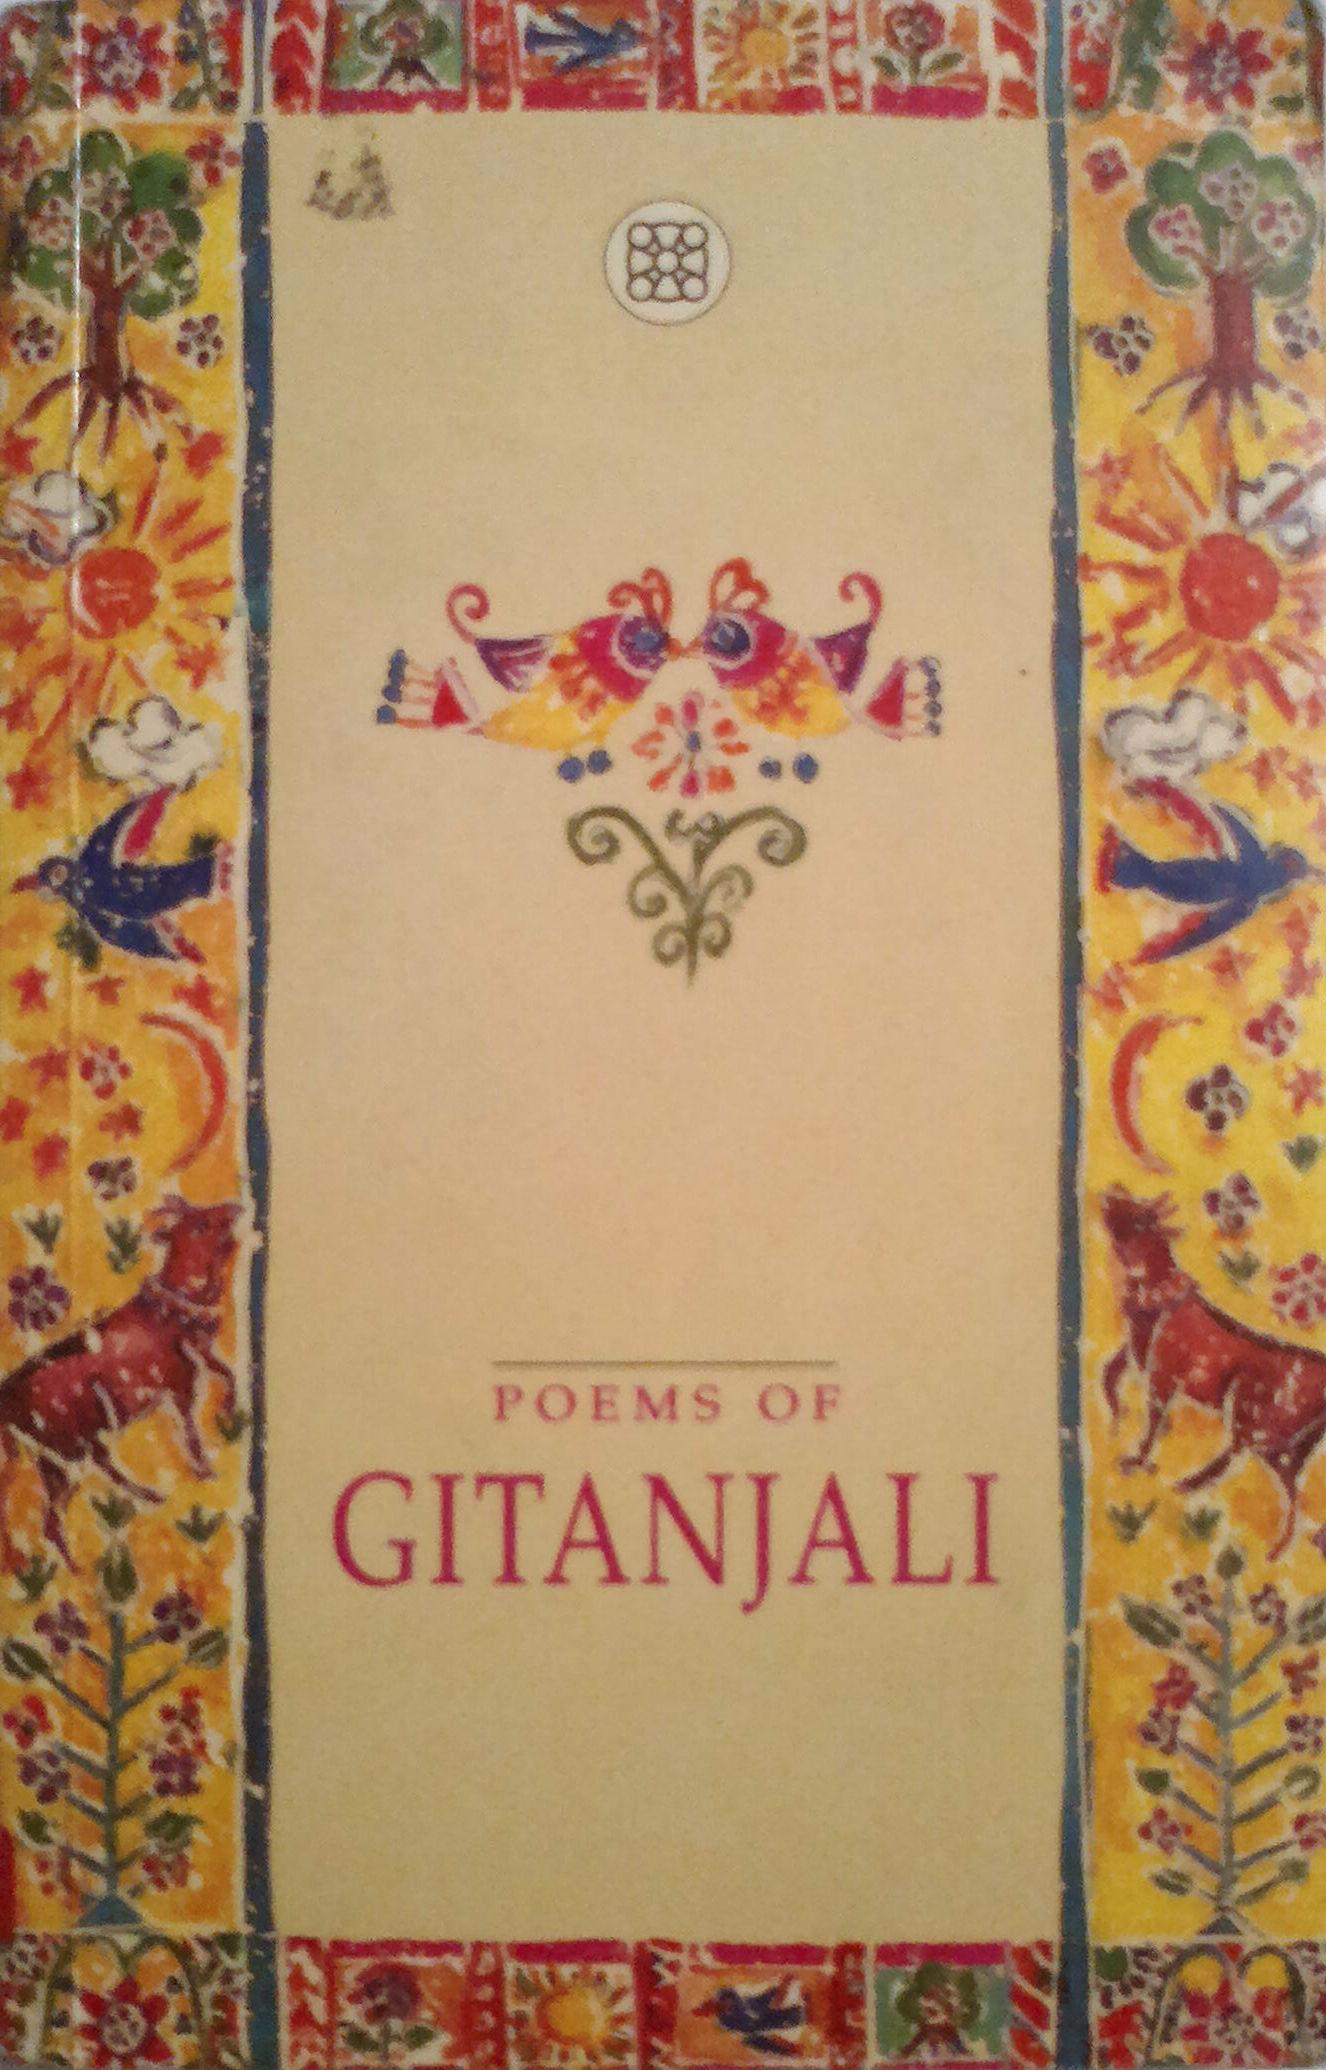 Poems of Gitanjali